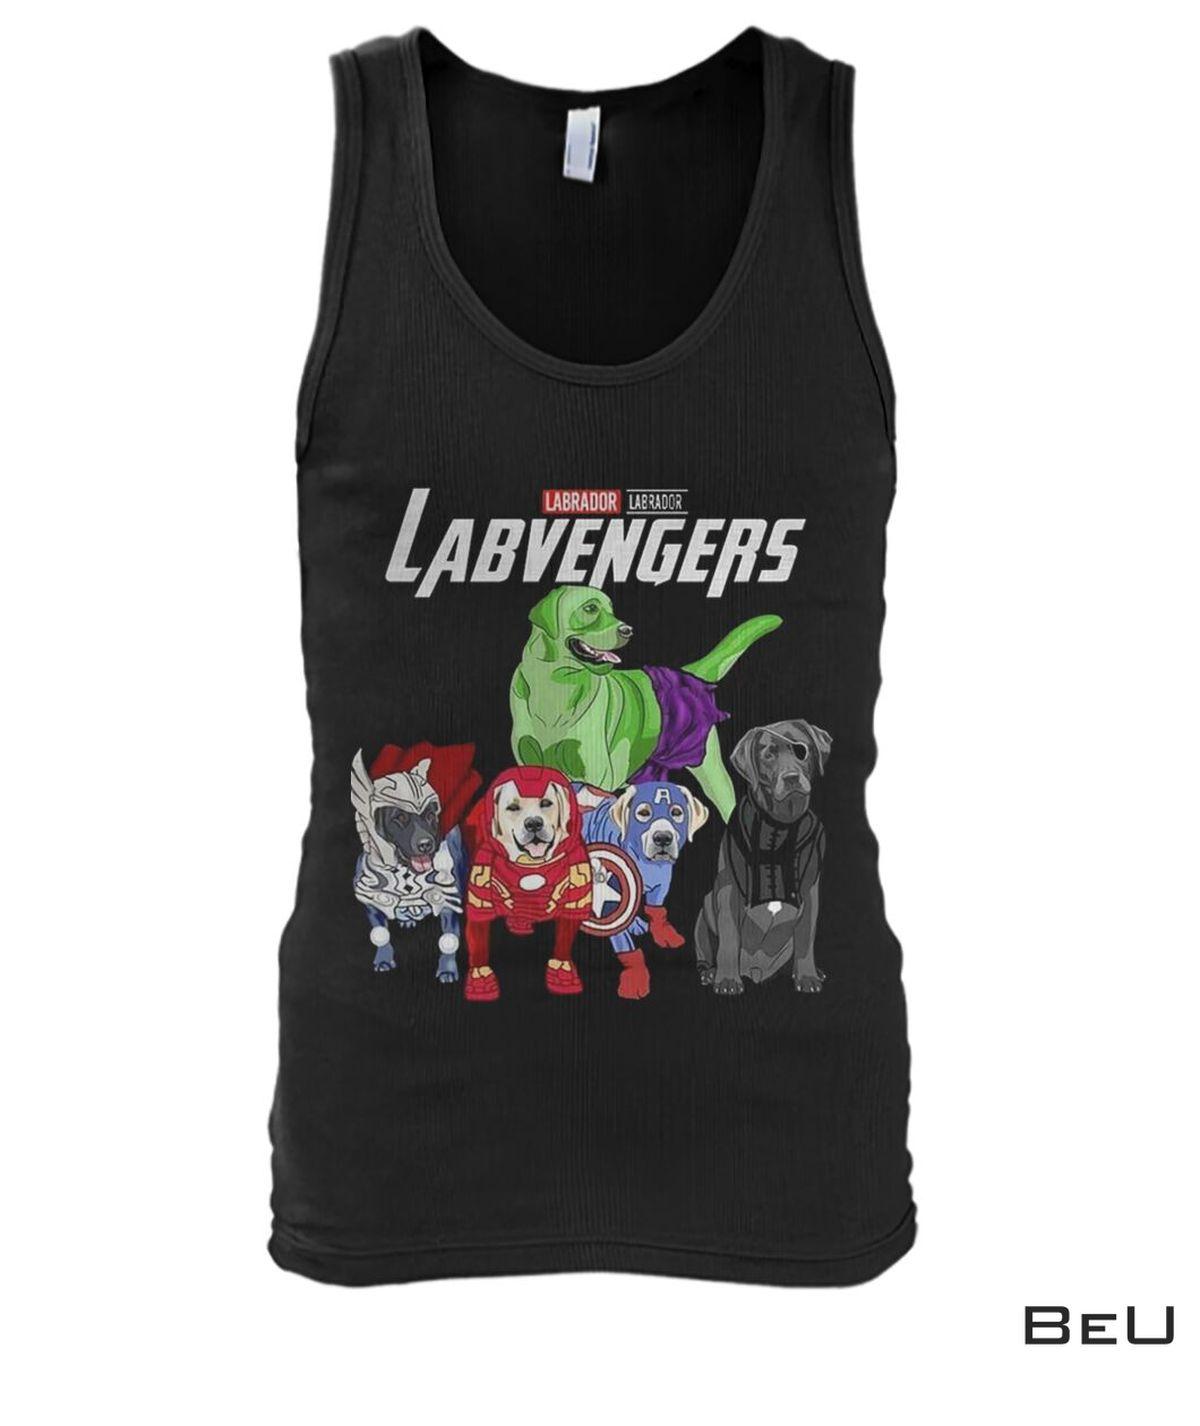 Labrador Labvengers Avengers Shirtx